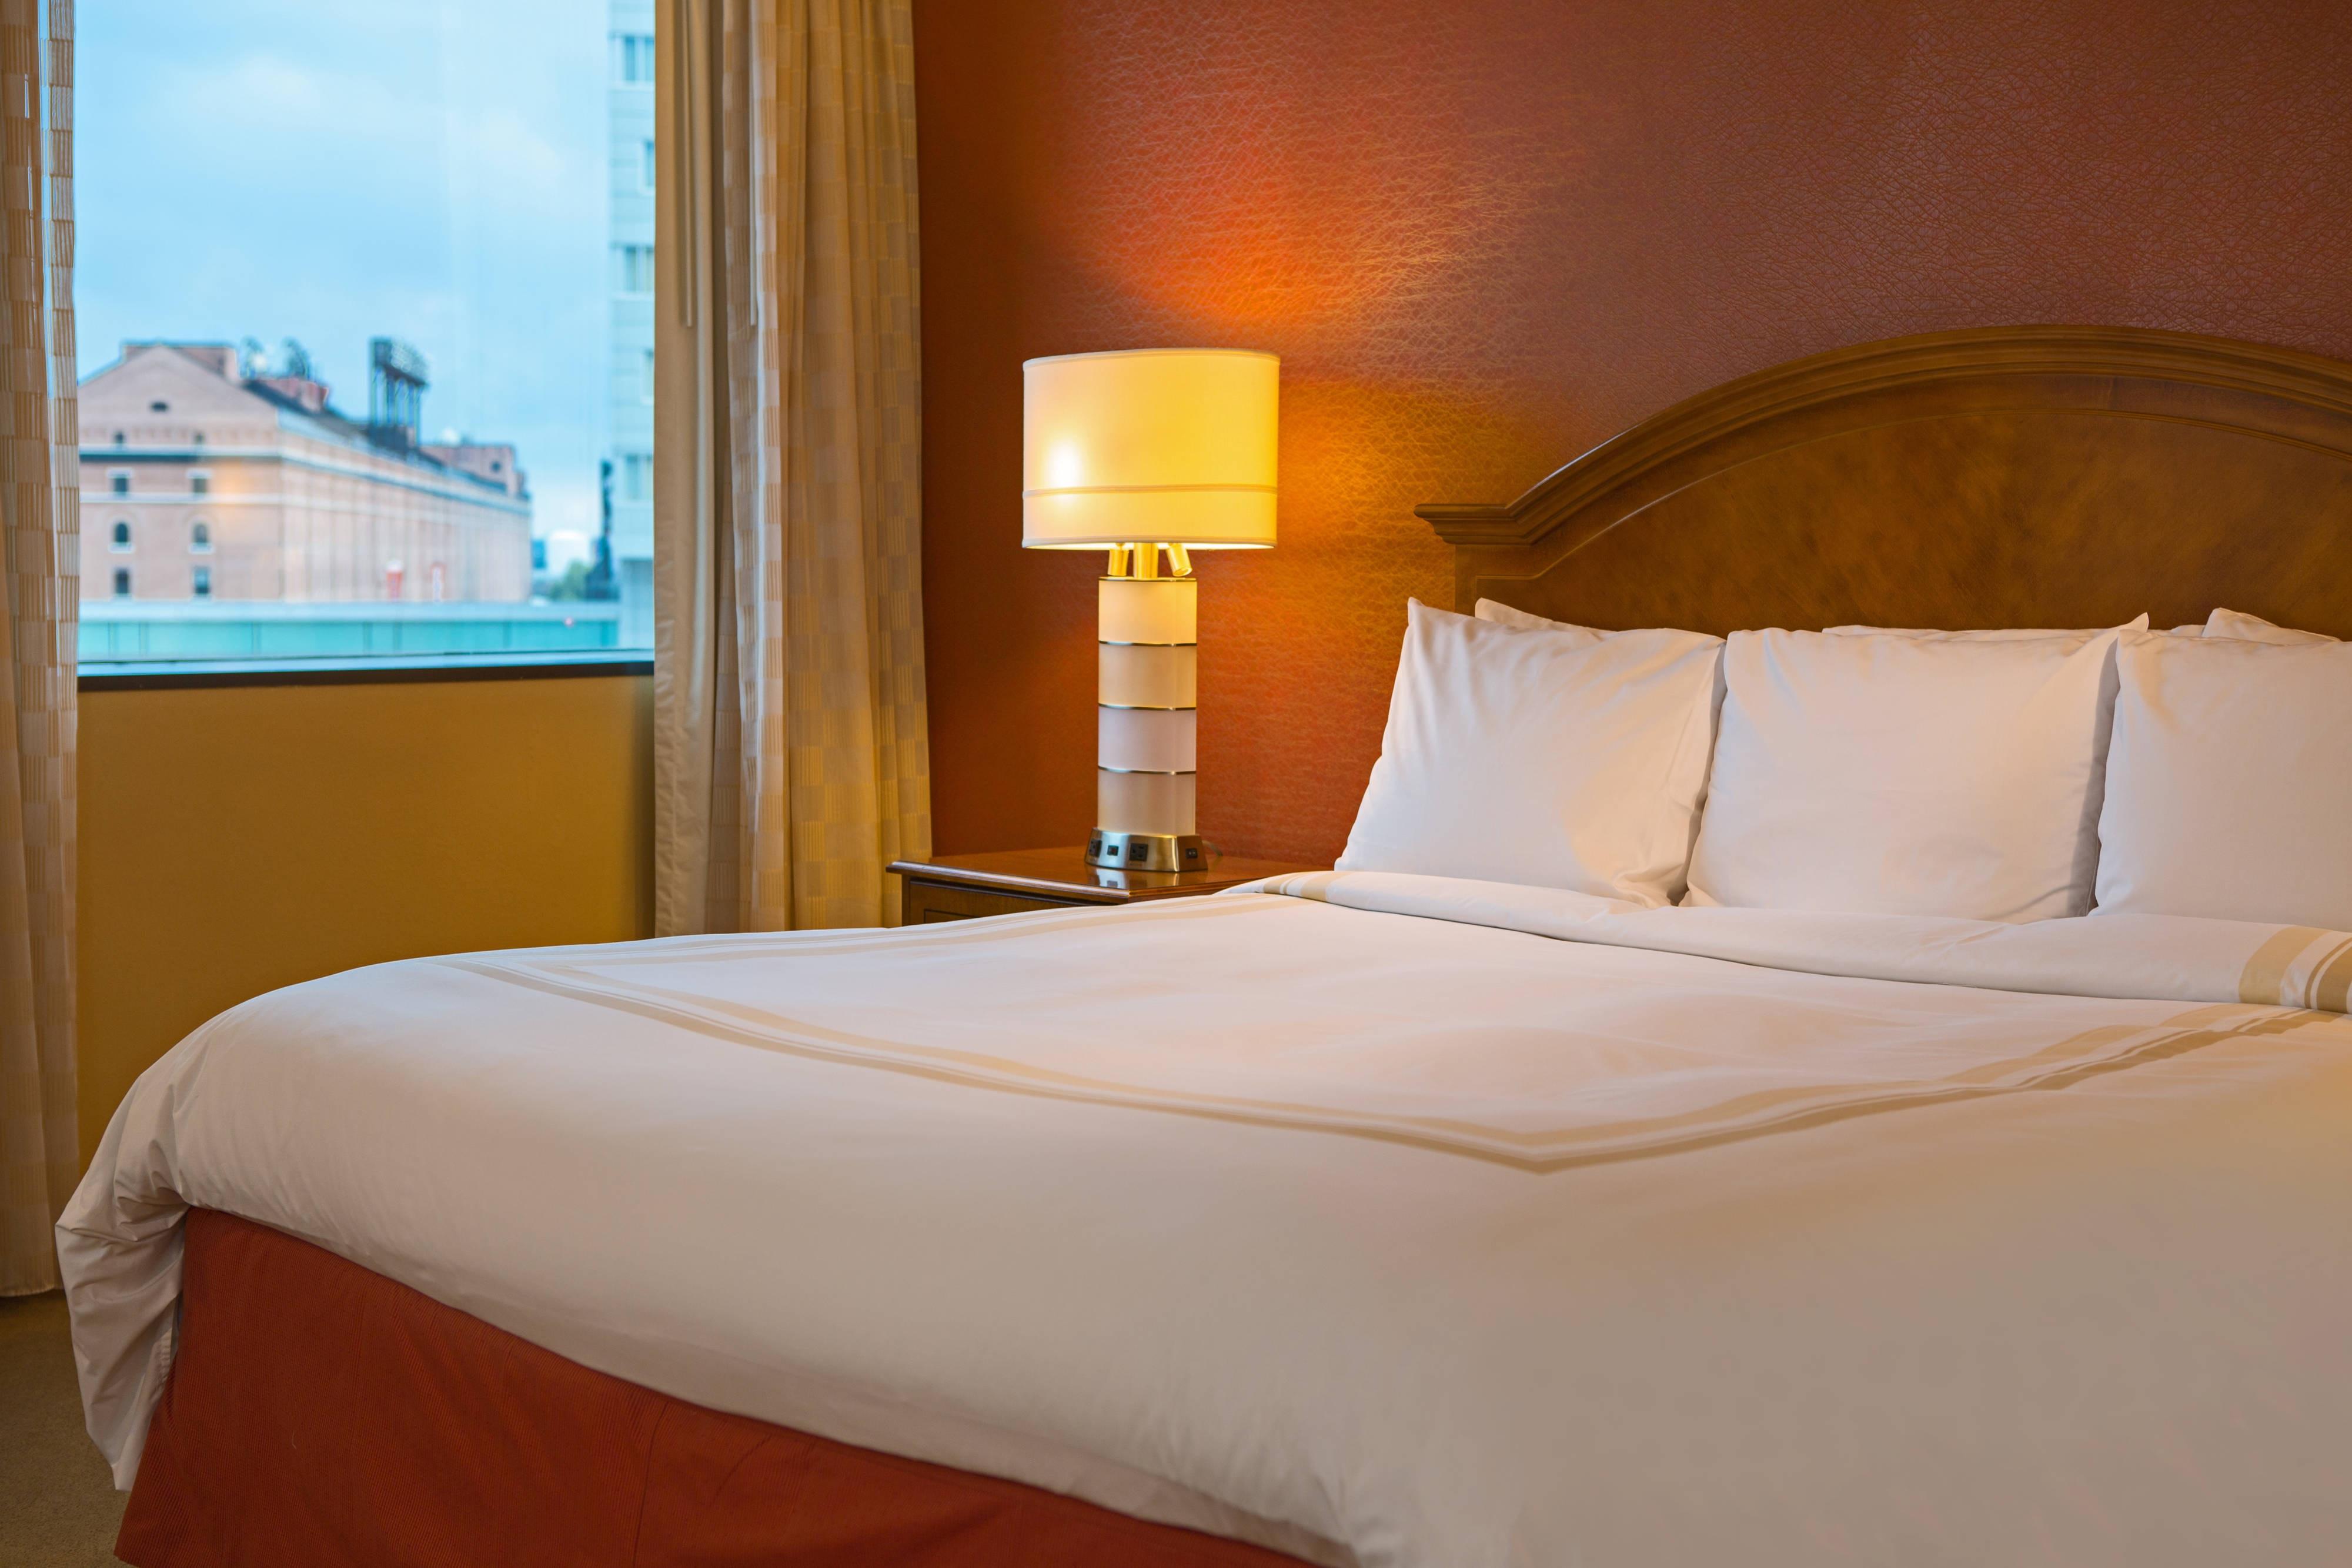 Baltimore hotel larger king room